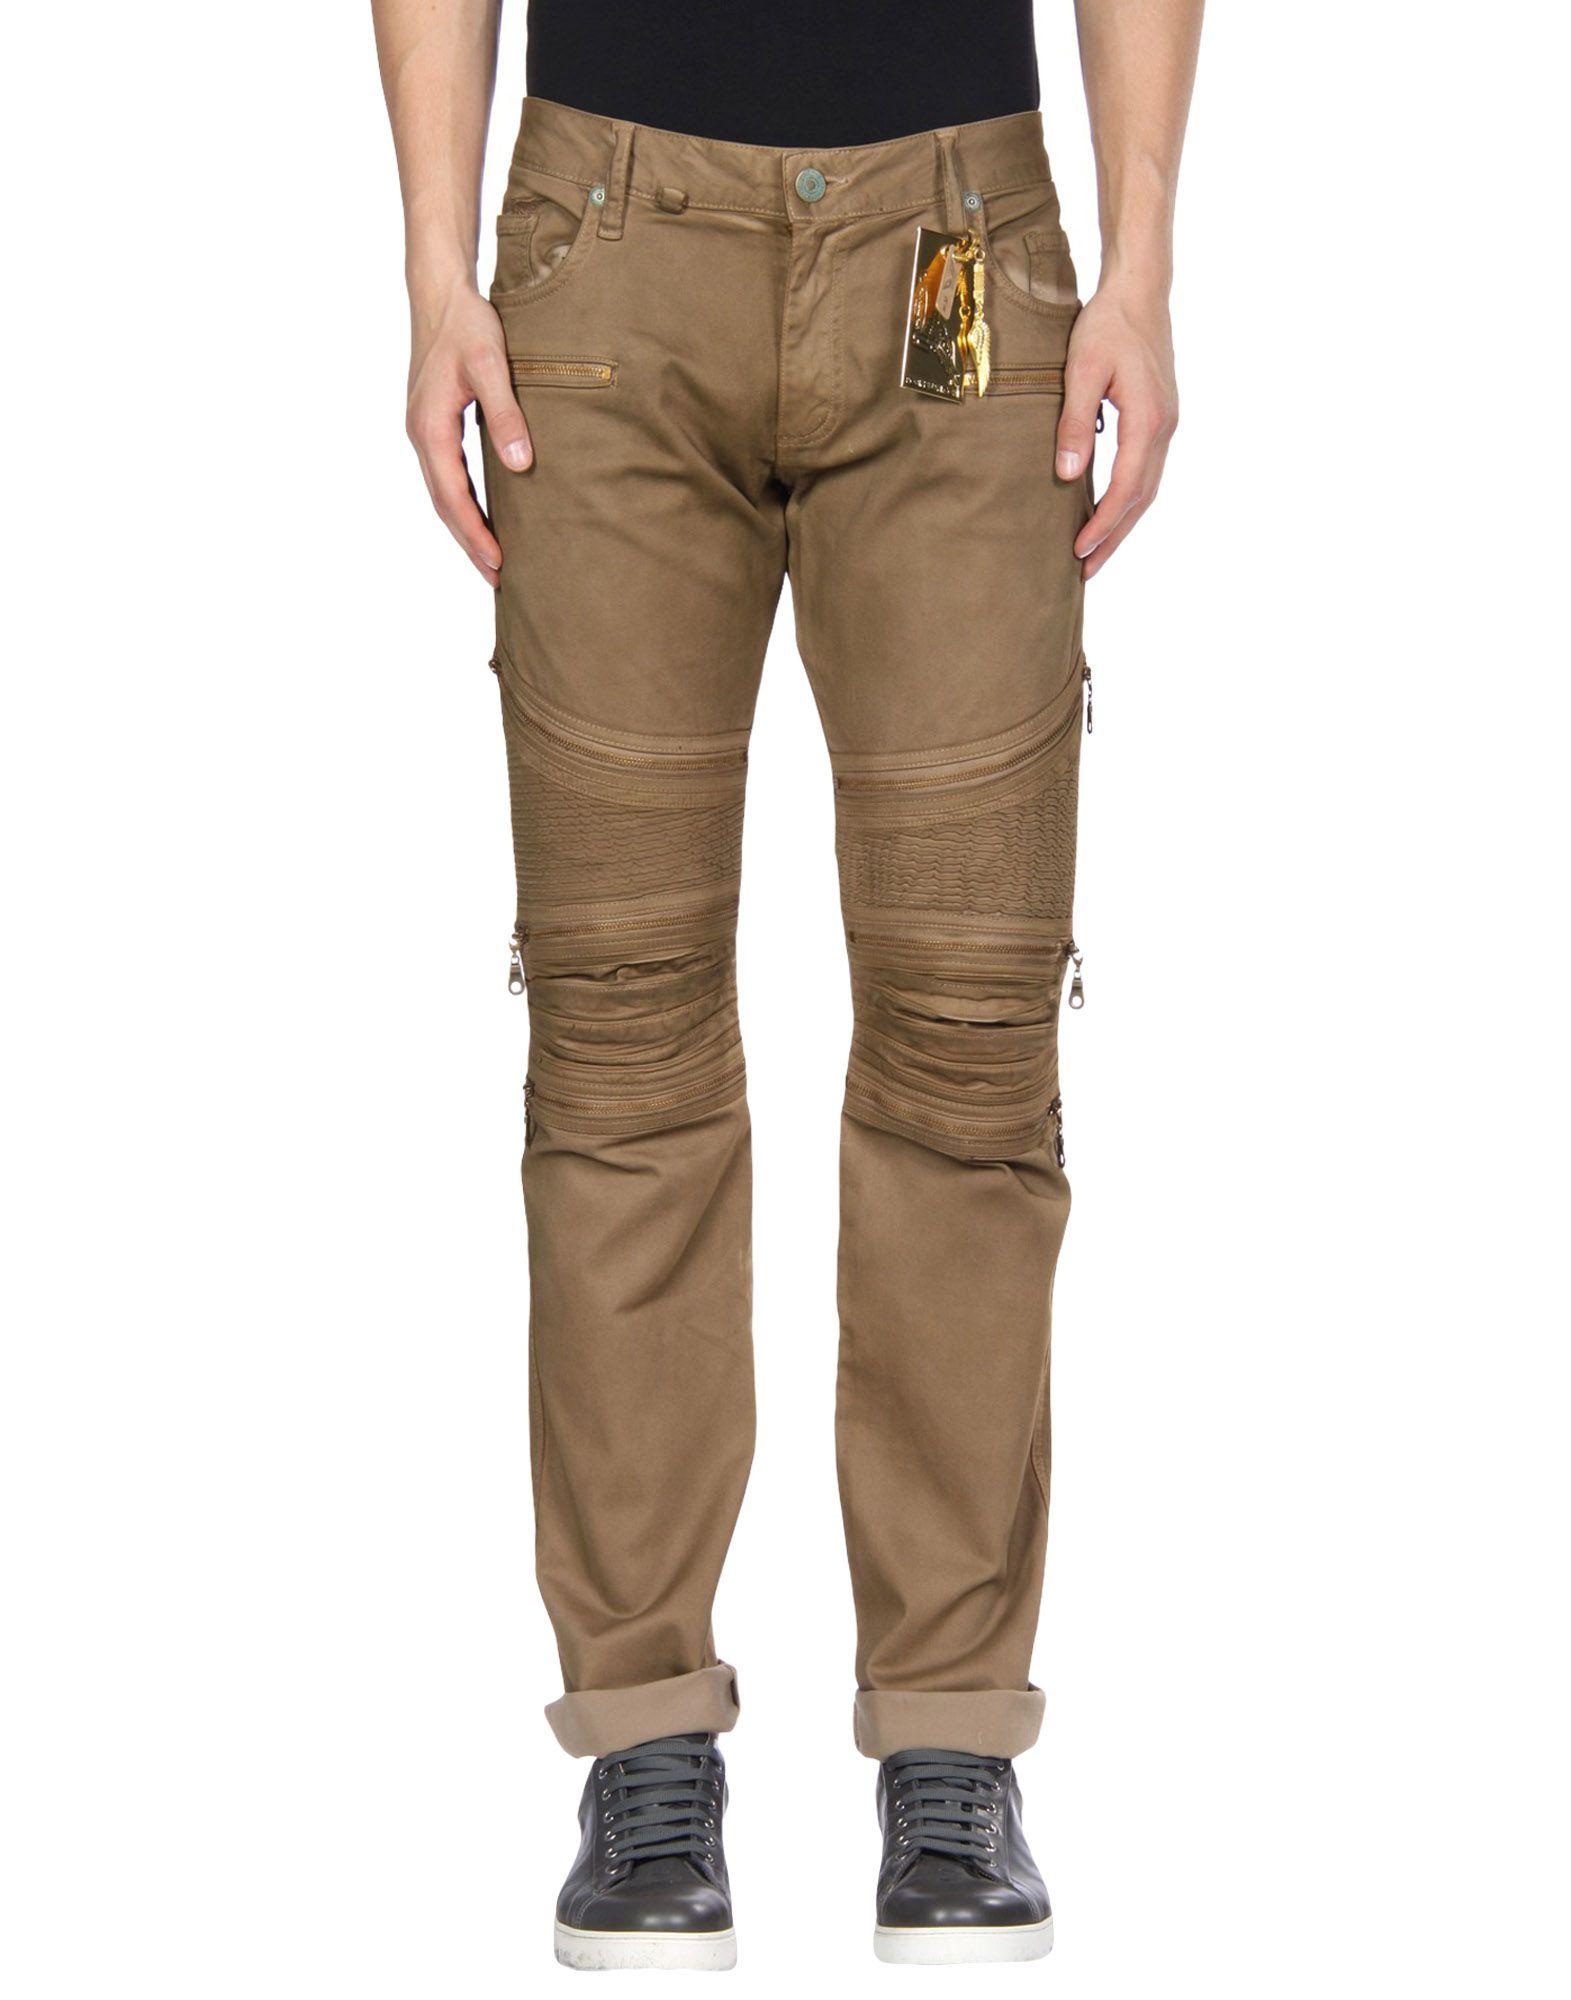 ROBIN'S JEAN Casual Pants in Khaki